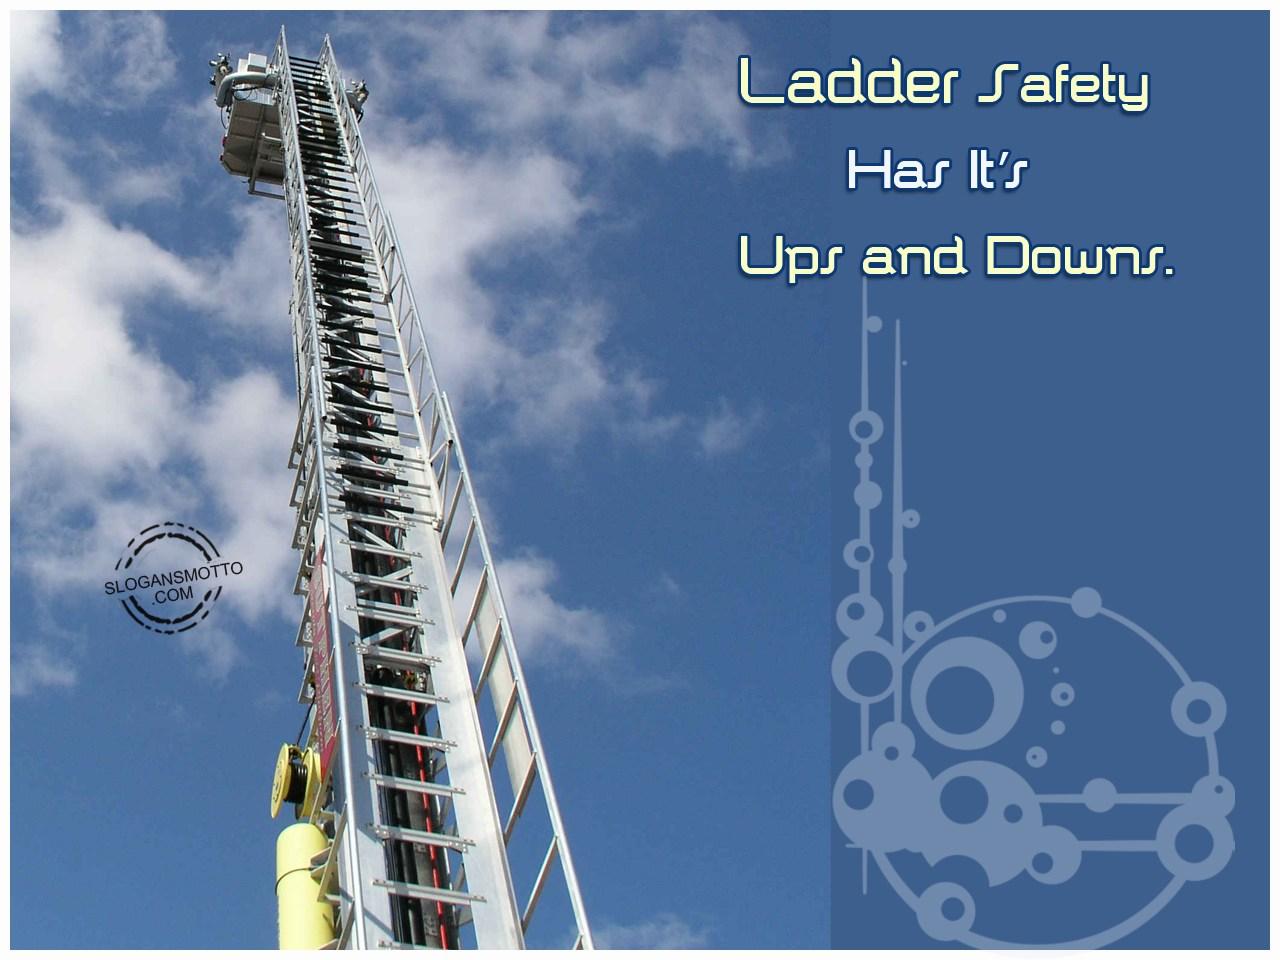 Funny Ladder Safety Slogans